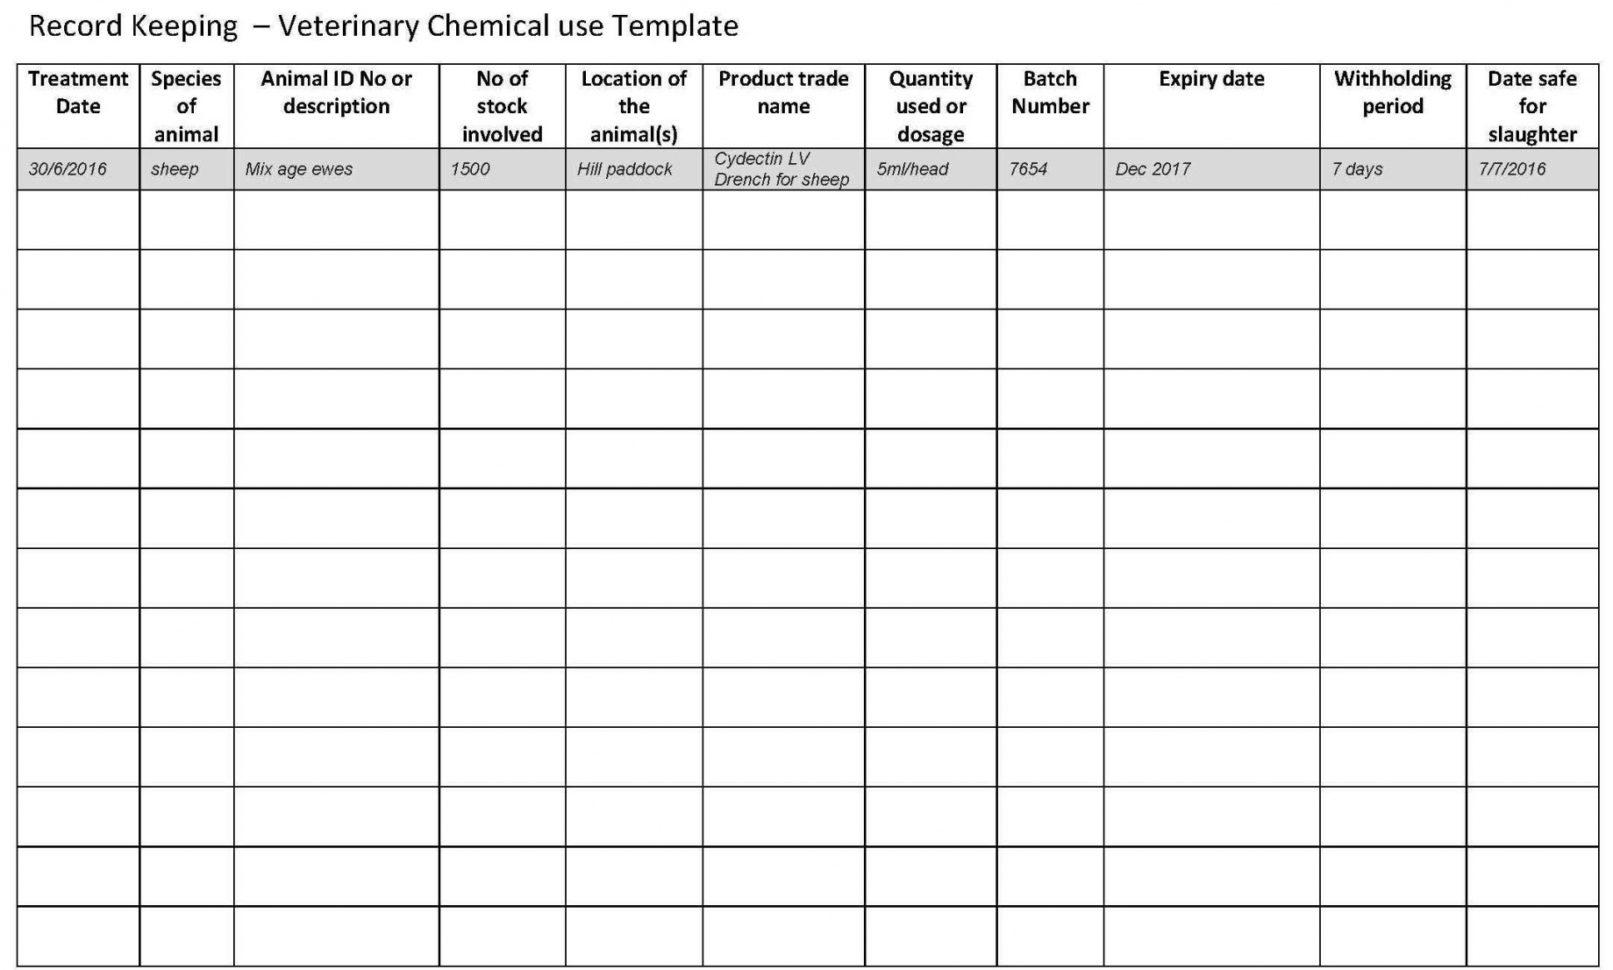 Farm Spreadsheet Templates Regarding Farm Spreadsheet Templates Idea Of Cattle Management App Accounts